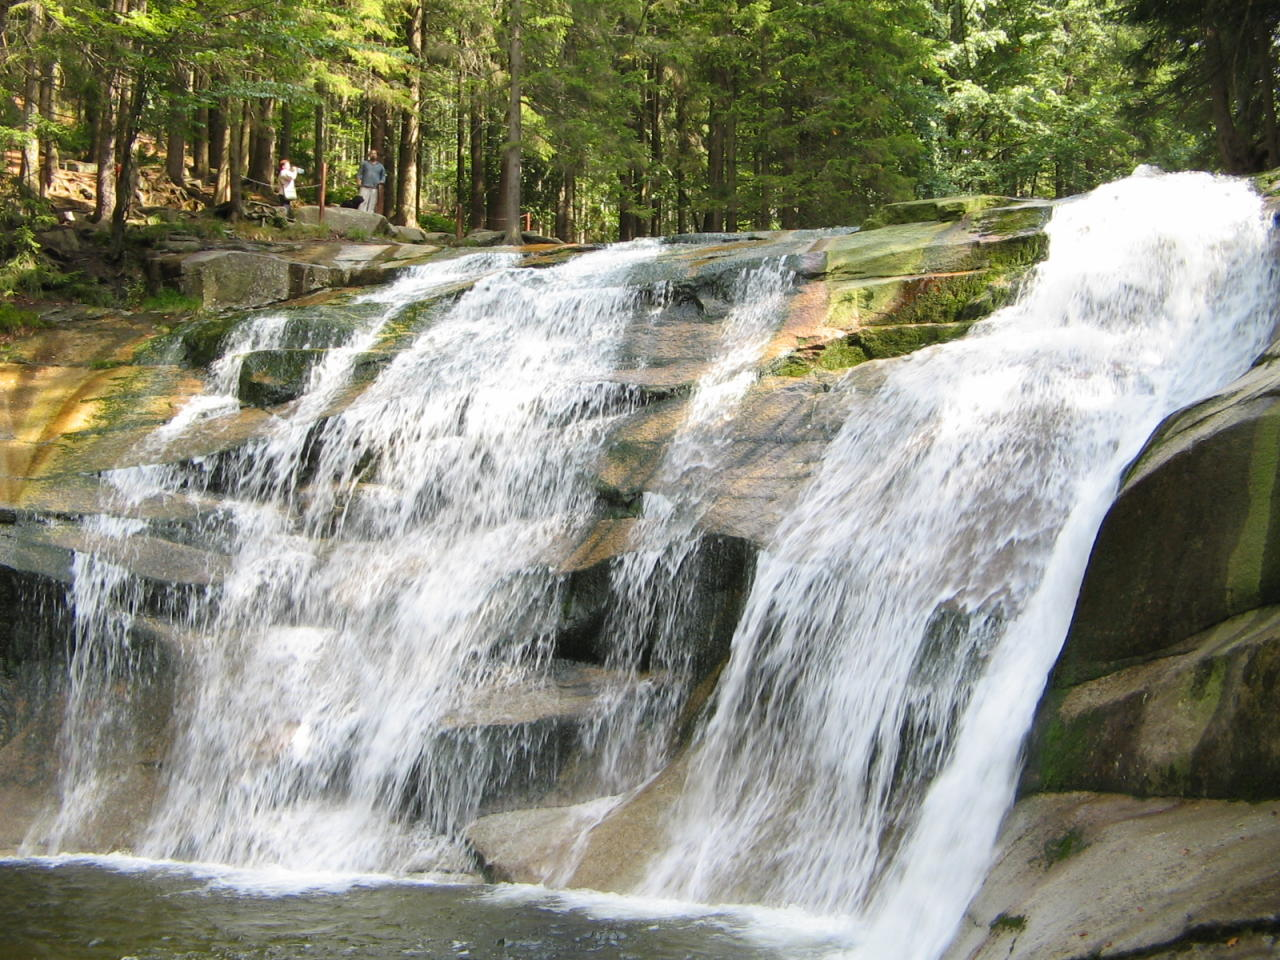 File:Mumlavsky vodopad.jpg - Wikimedia Commons